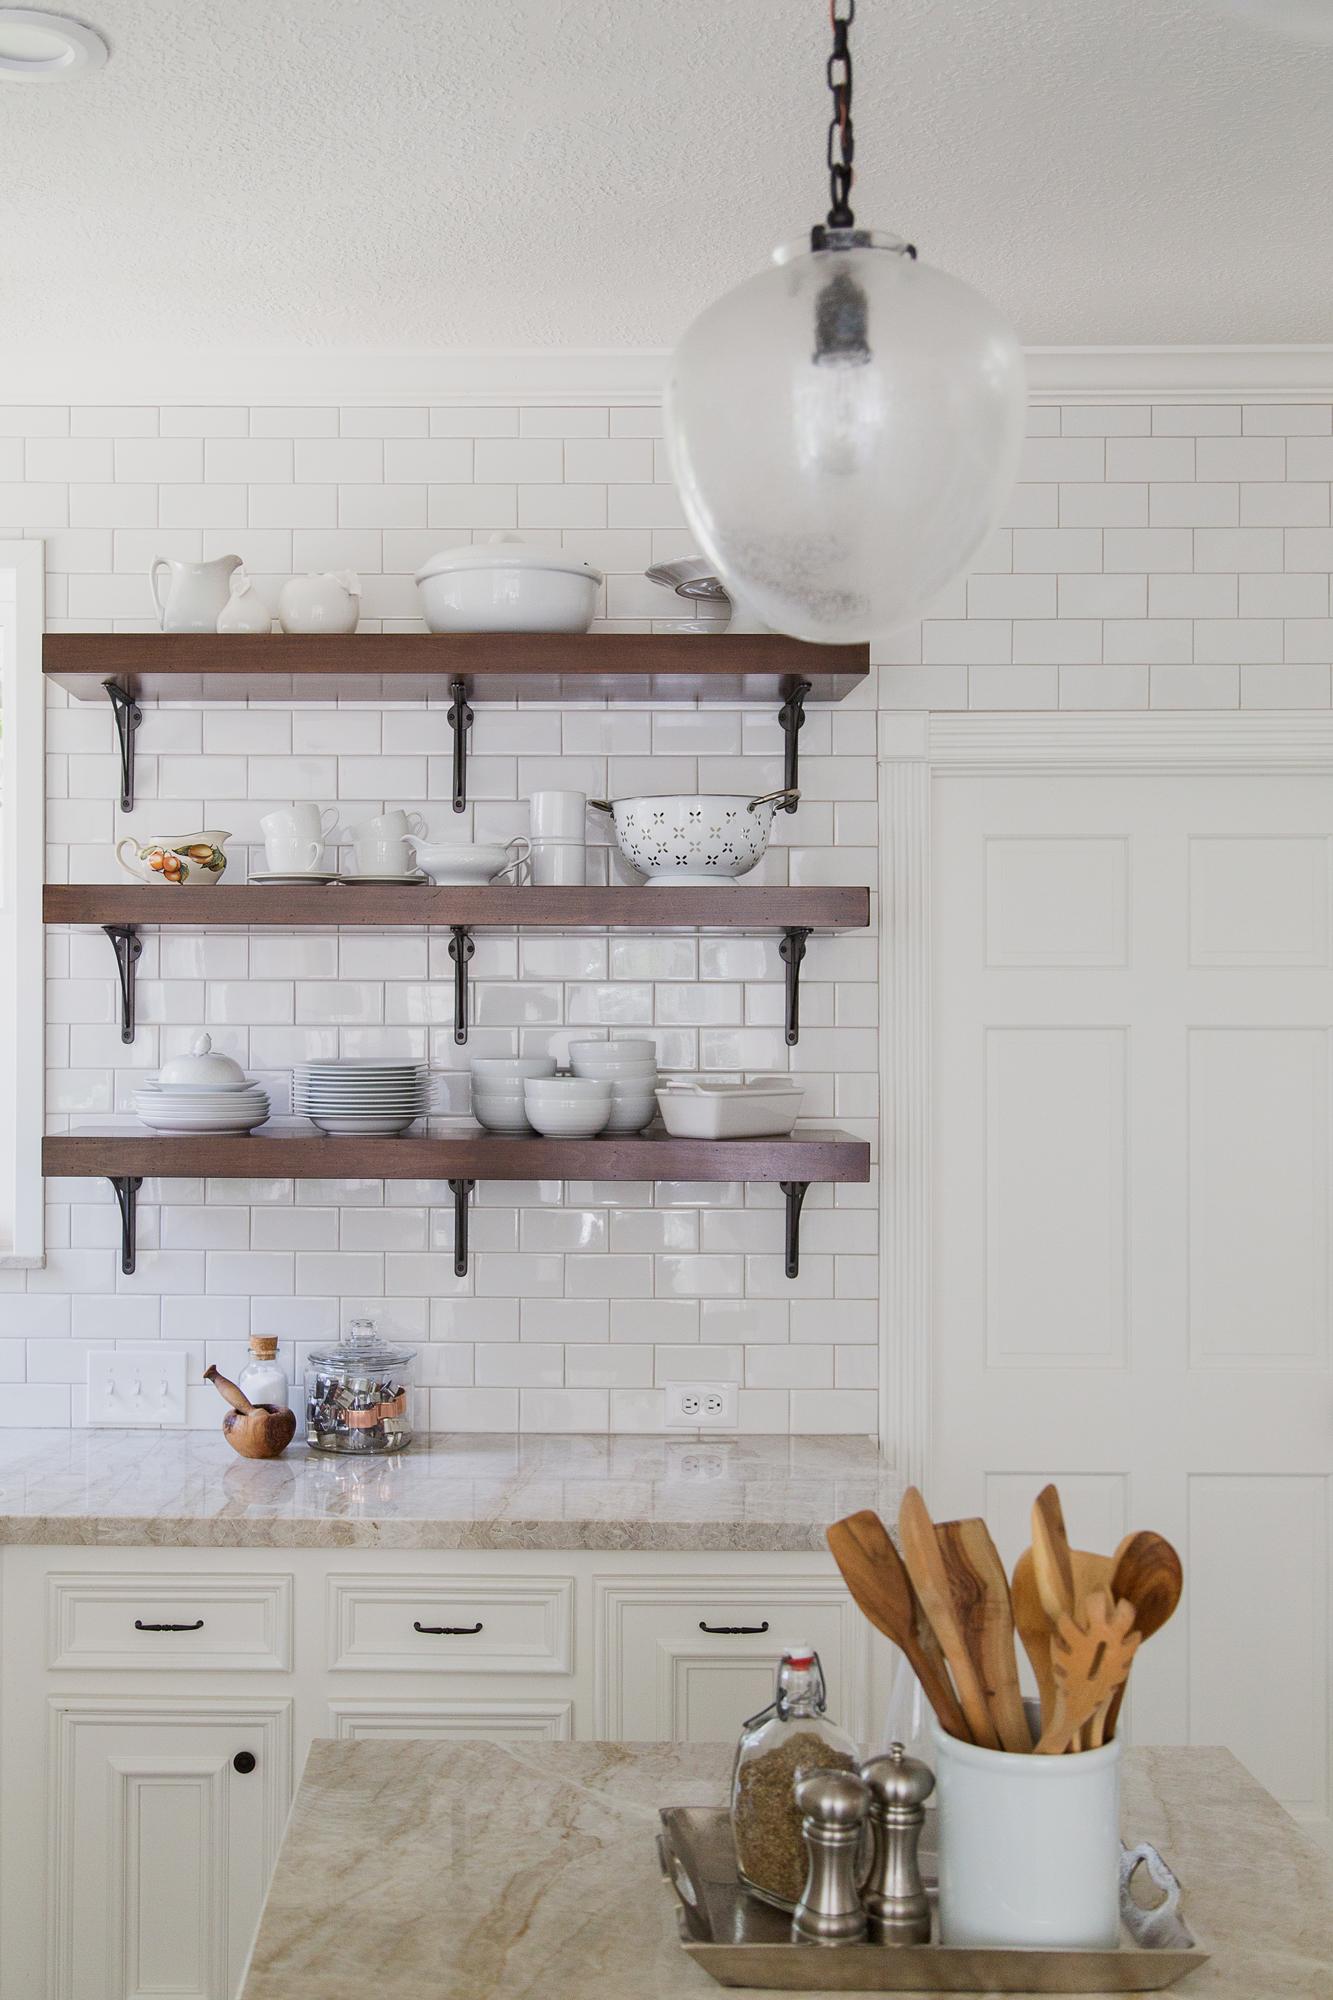 Kitchen Remodel - open shelving, subway tile wall, Designer: Carla Aston